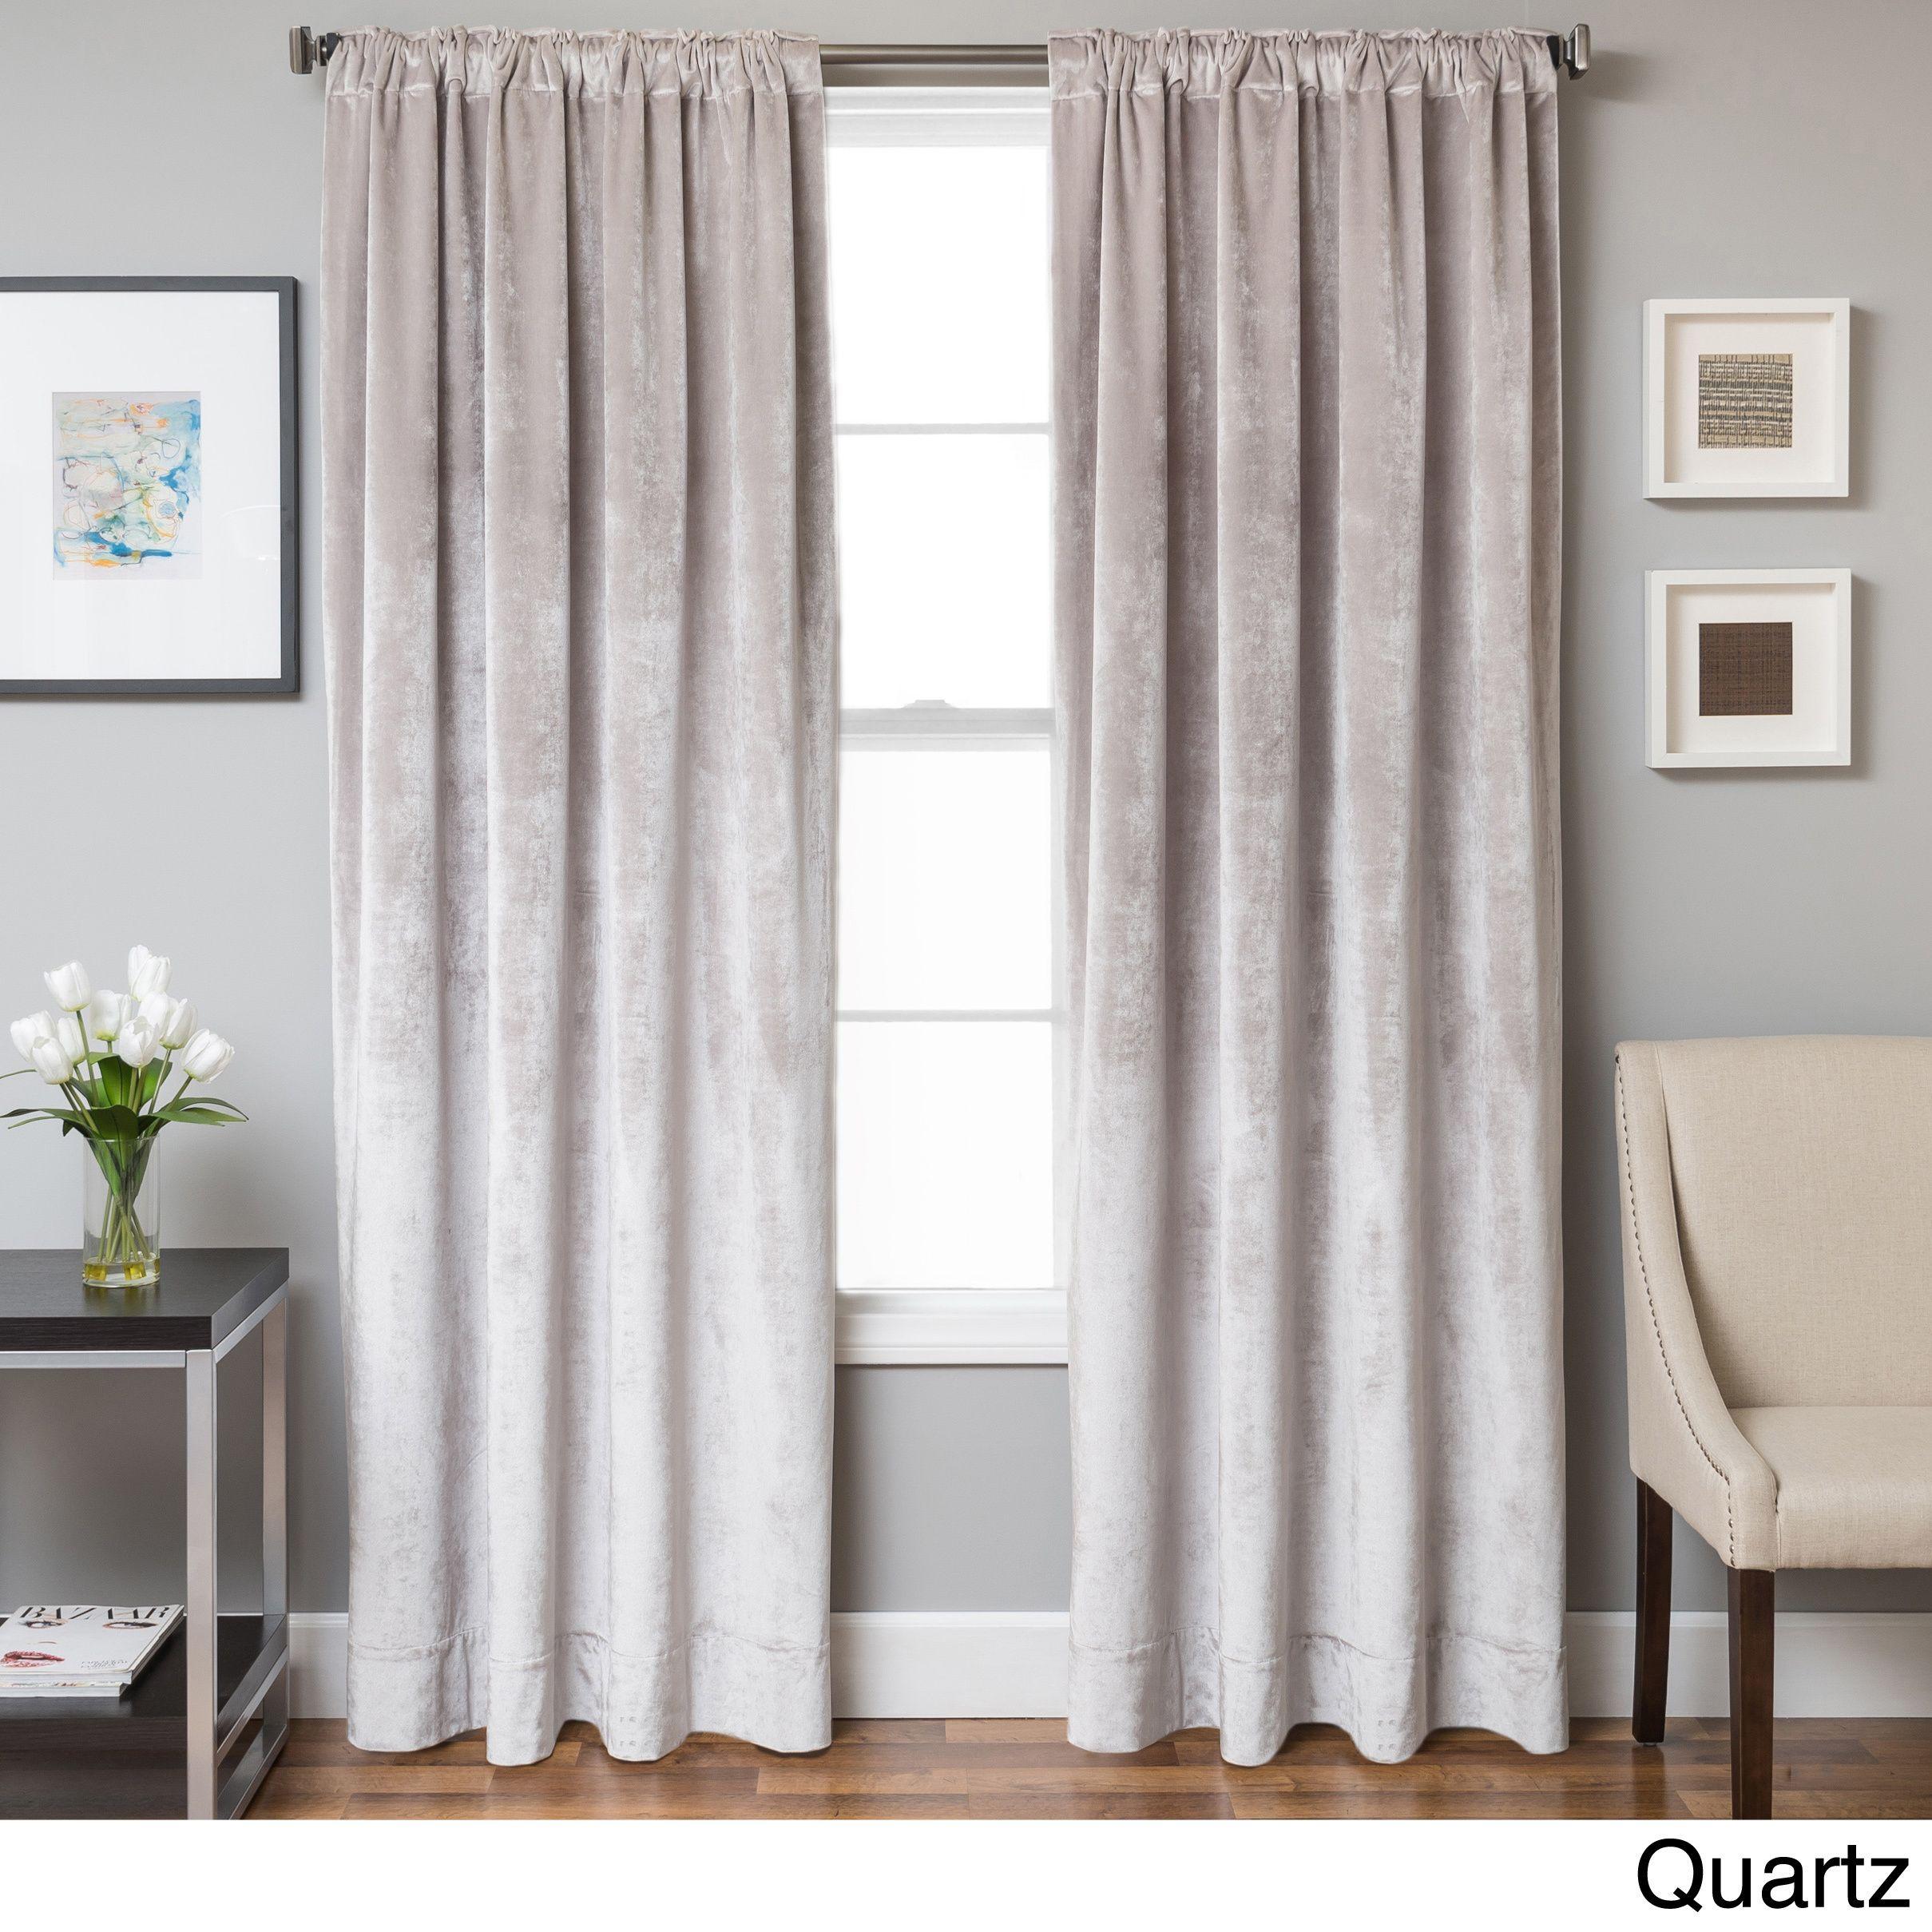 curtain index fawn drapes velvet birkin panels solid chadmade panel